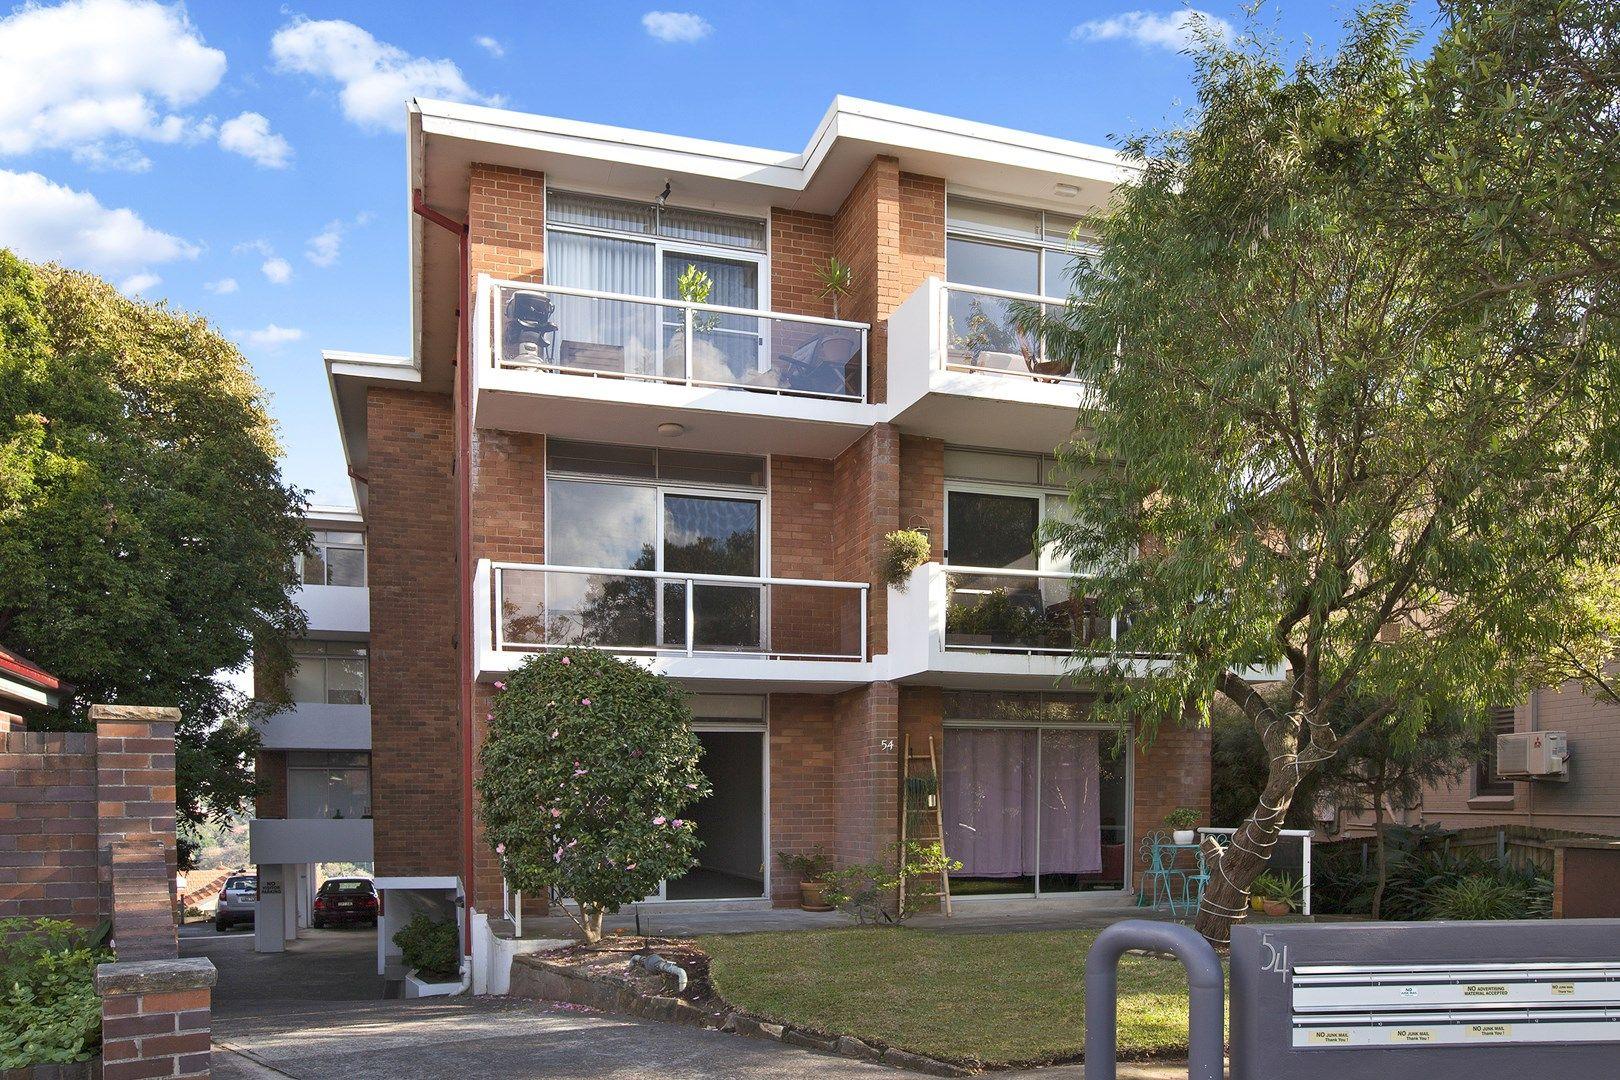 1/54 Raglan Street, Mosman NSW 2088, Image 0